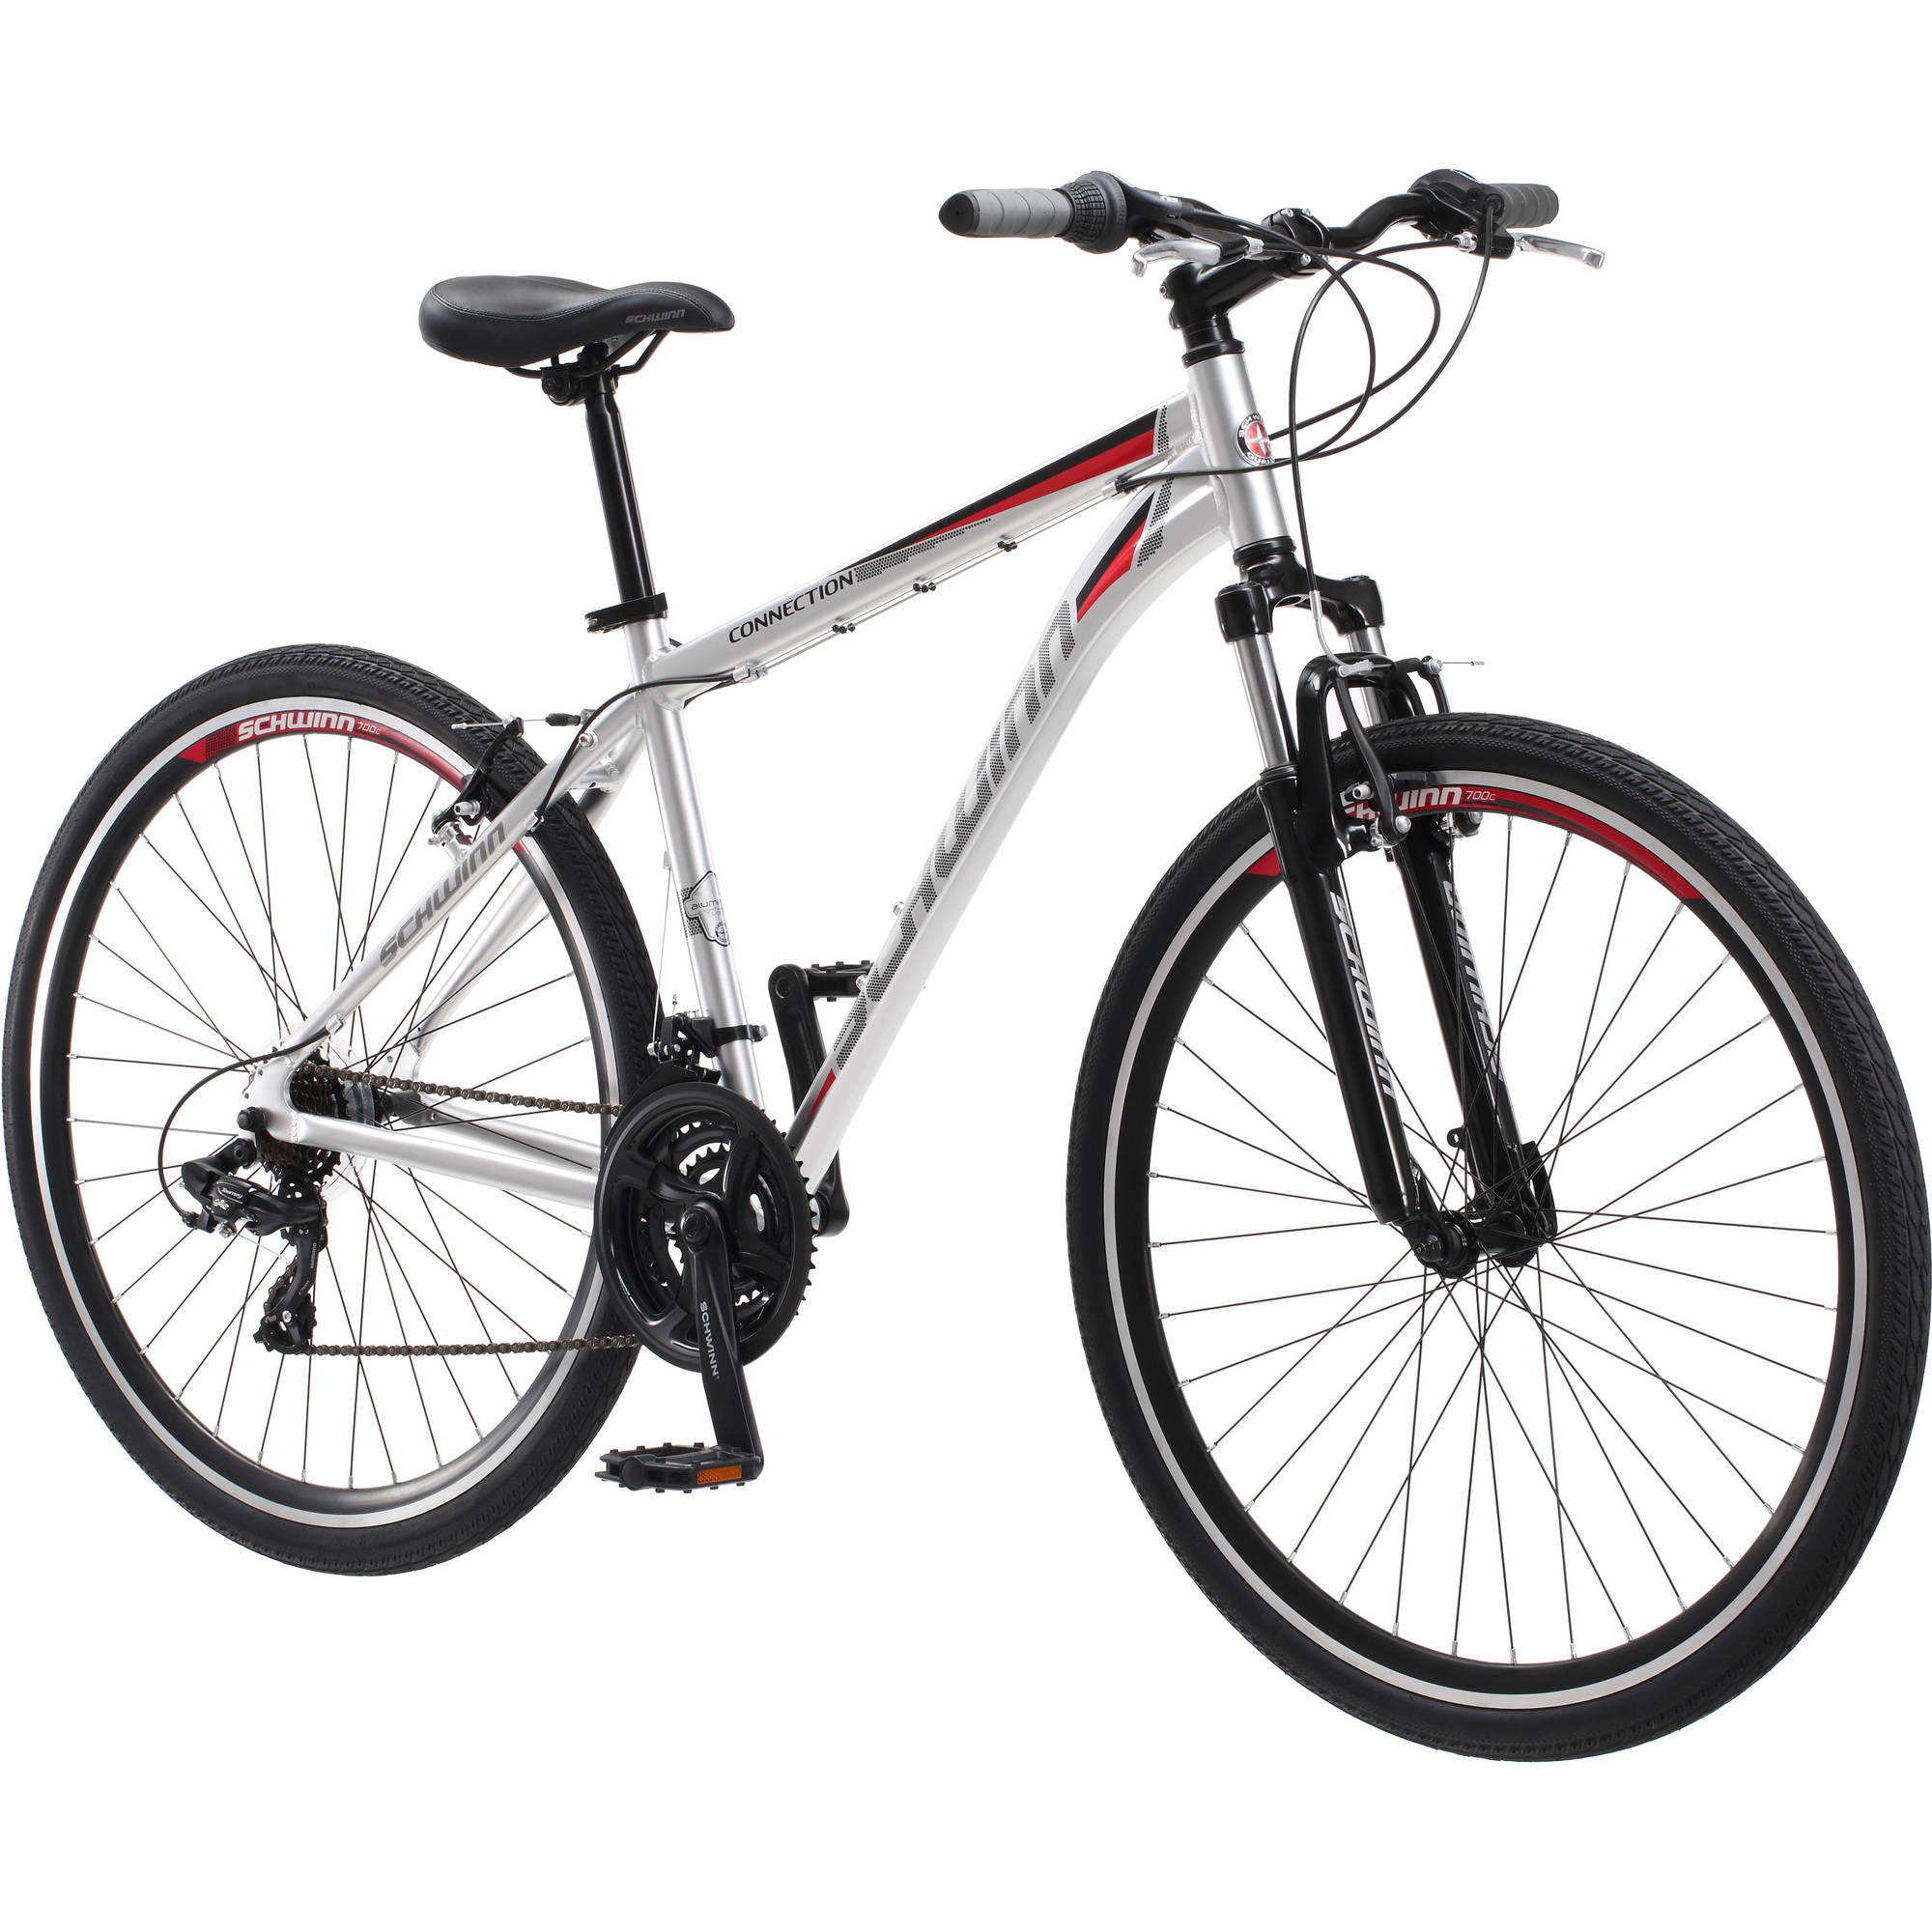 Schwinn 700c Men's Connection Multi-Use Bike